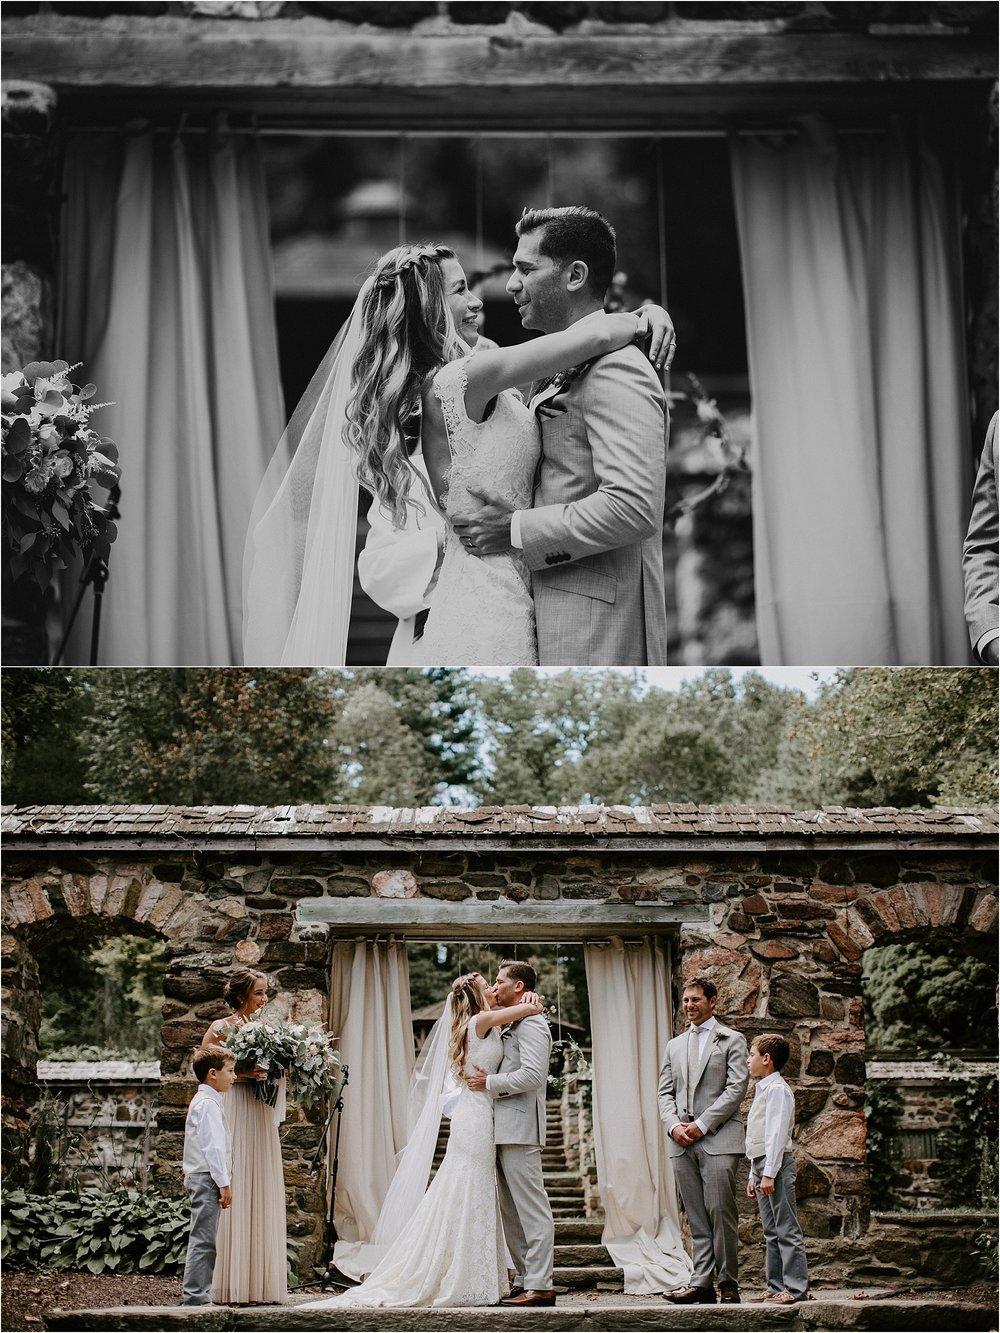 Sarah_Brookhart_Philadelphia_Wedding_Photographer_0028.jpg